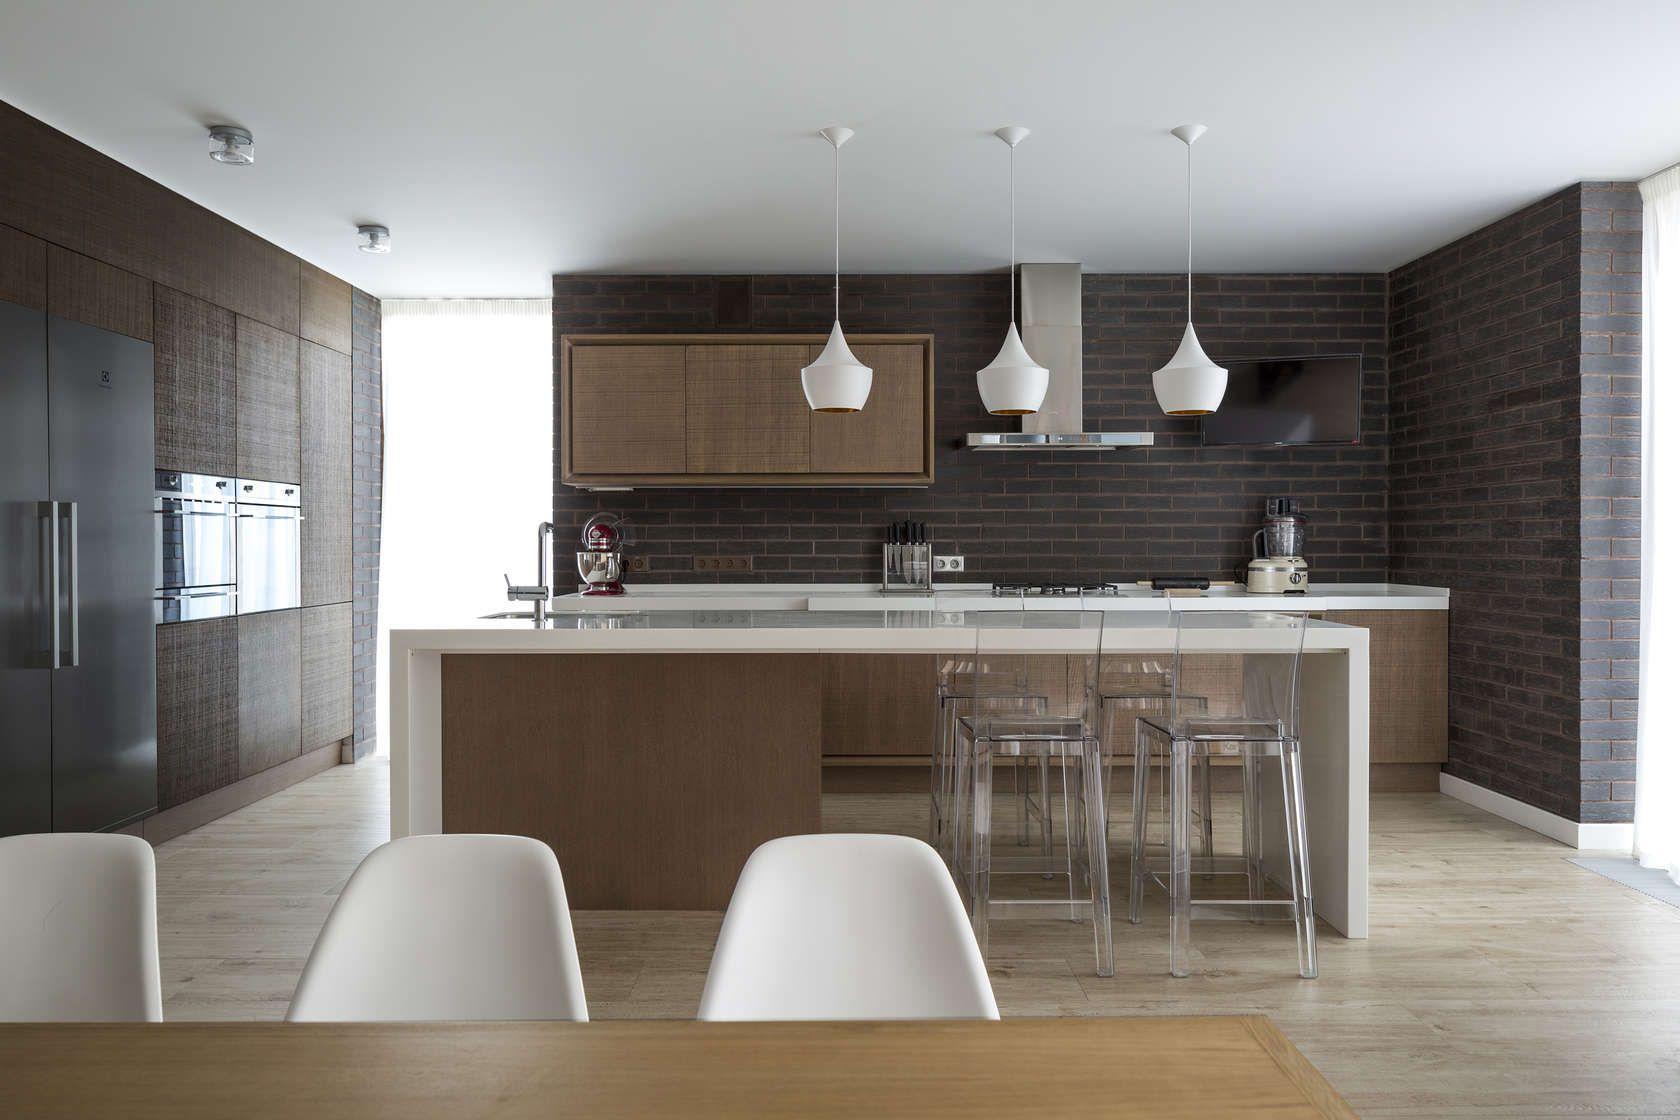 Diseño de casa de madera de dos pisos, moderna y armoniosa ...